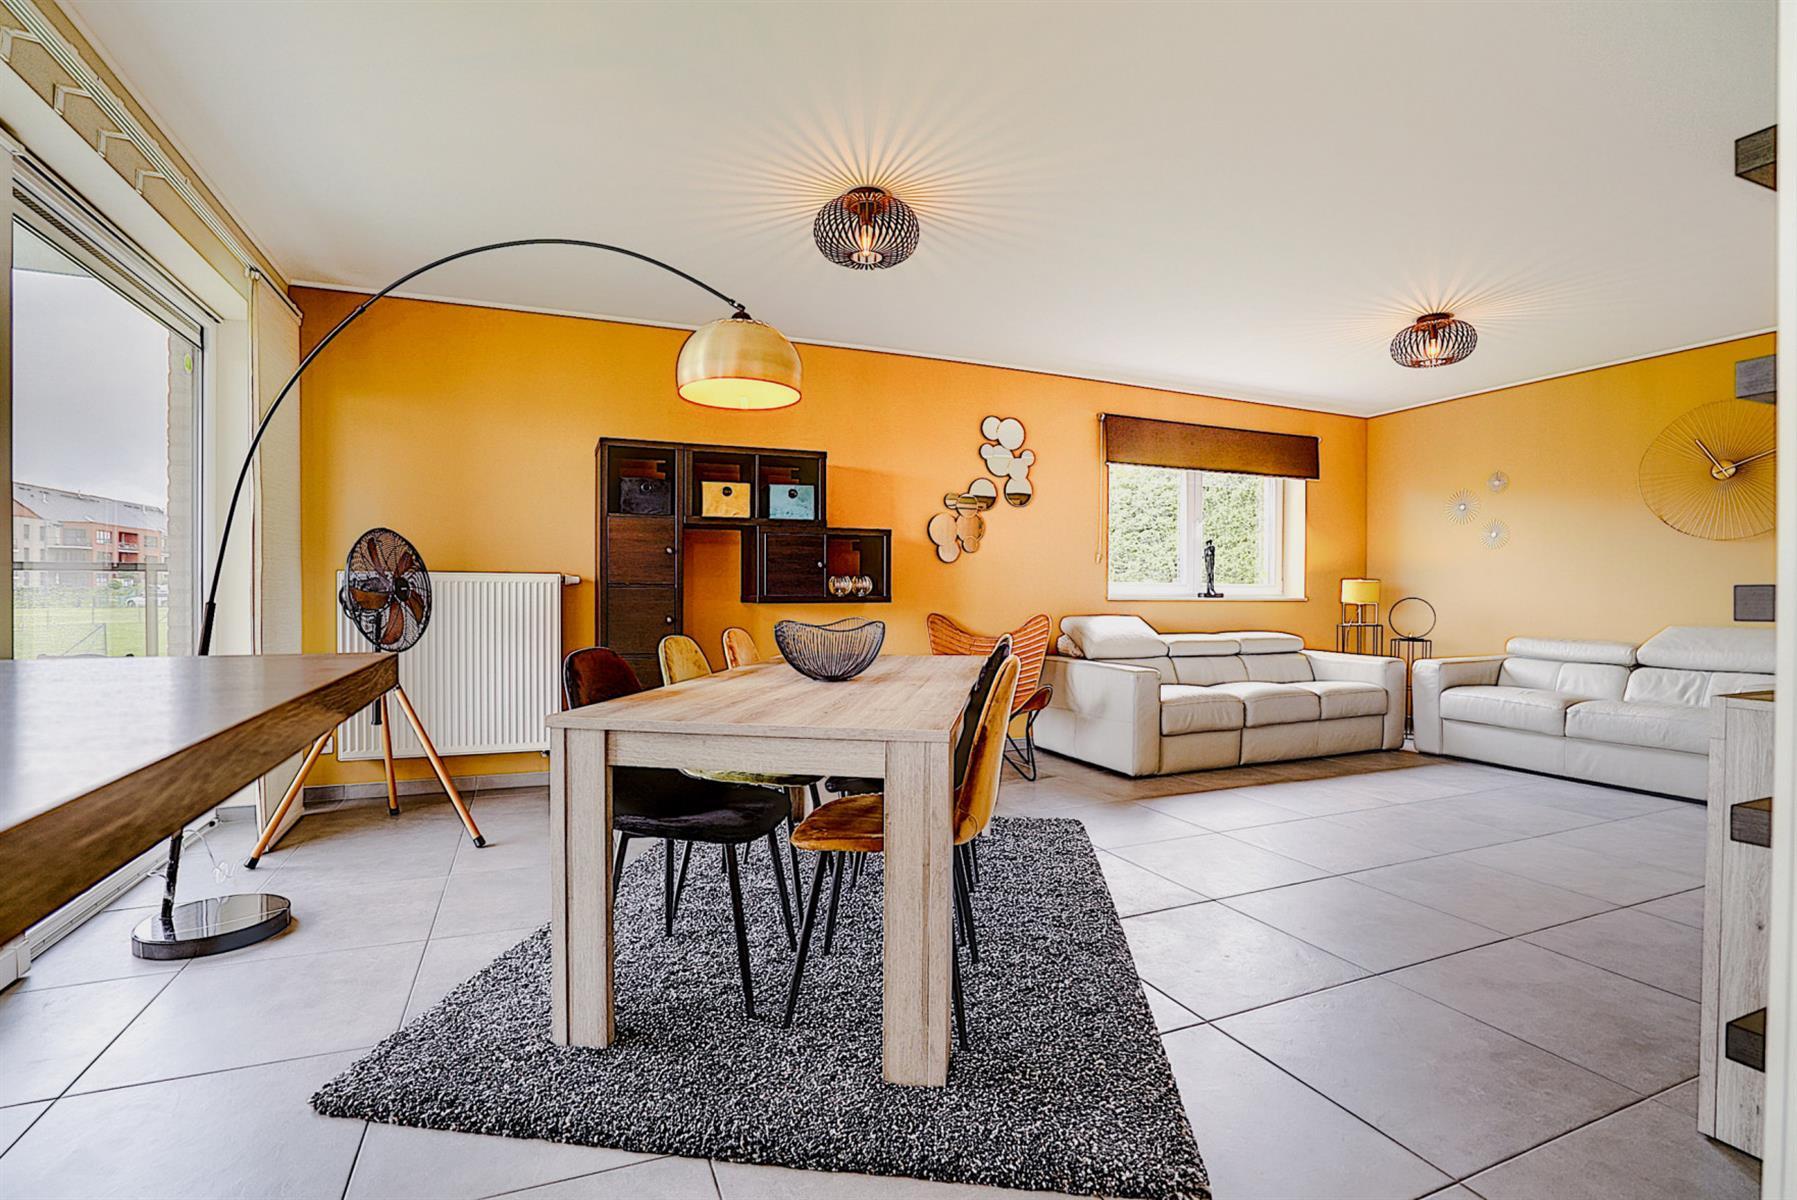 Appartement - Grâce-hollogne - #4364483-6